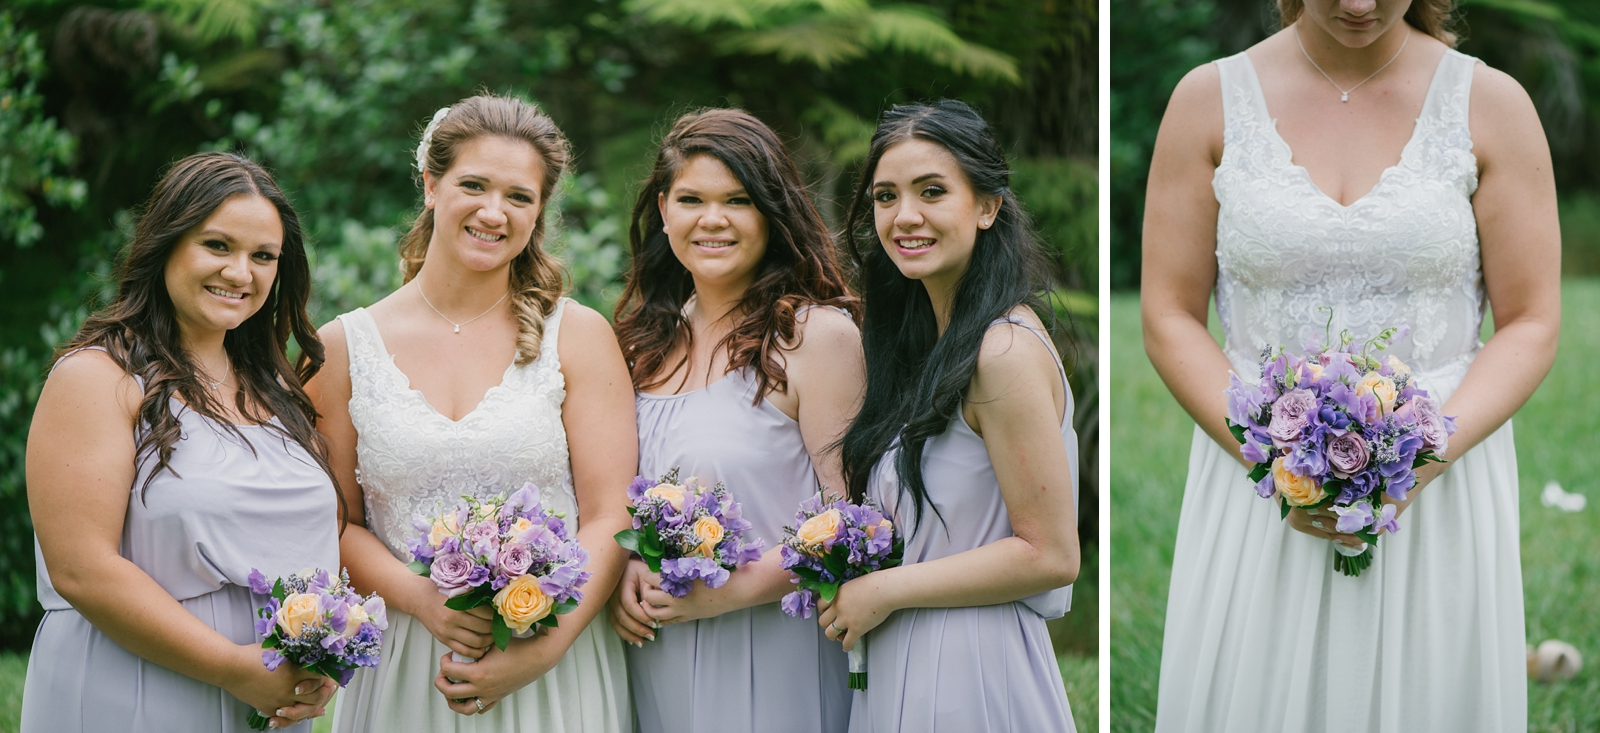 GabbyFiti_Auckland Wedding Photographer_Patty Lagera_0061.jpg